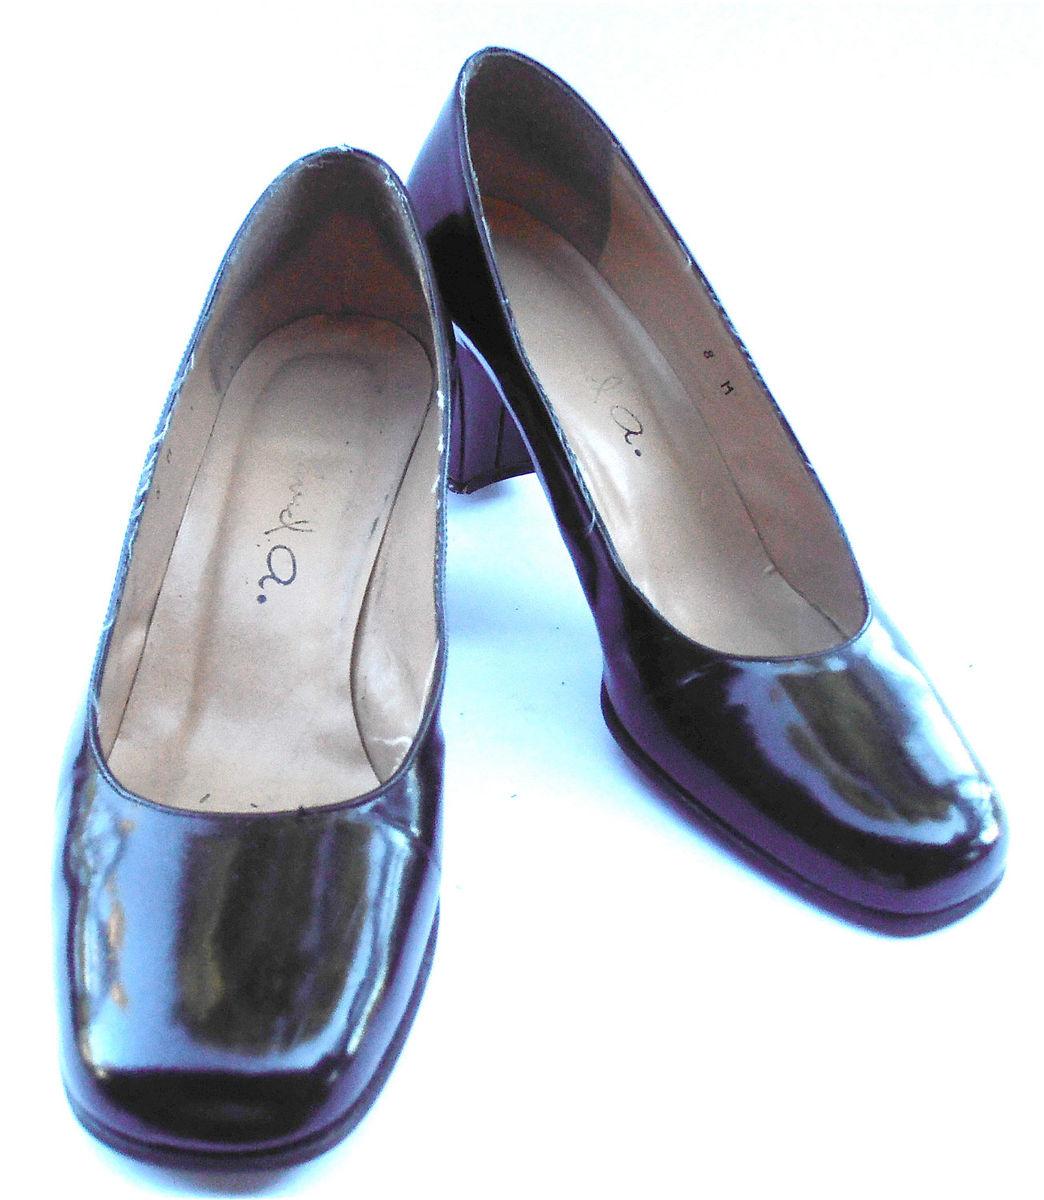 9396dad49e81 Vintage Black Vintage Basic Black Patent Leather Pump Classic Retro Ladies  Shoes Round Toe Shoe Size 8 Chunky High ...